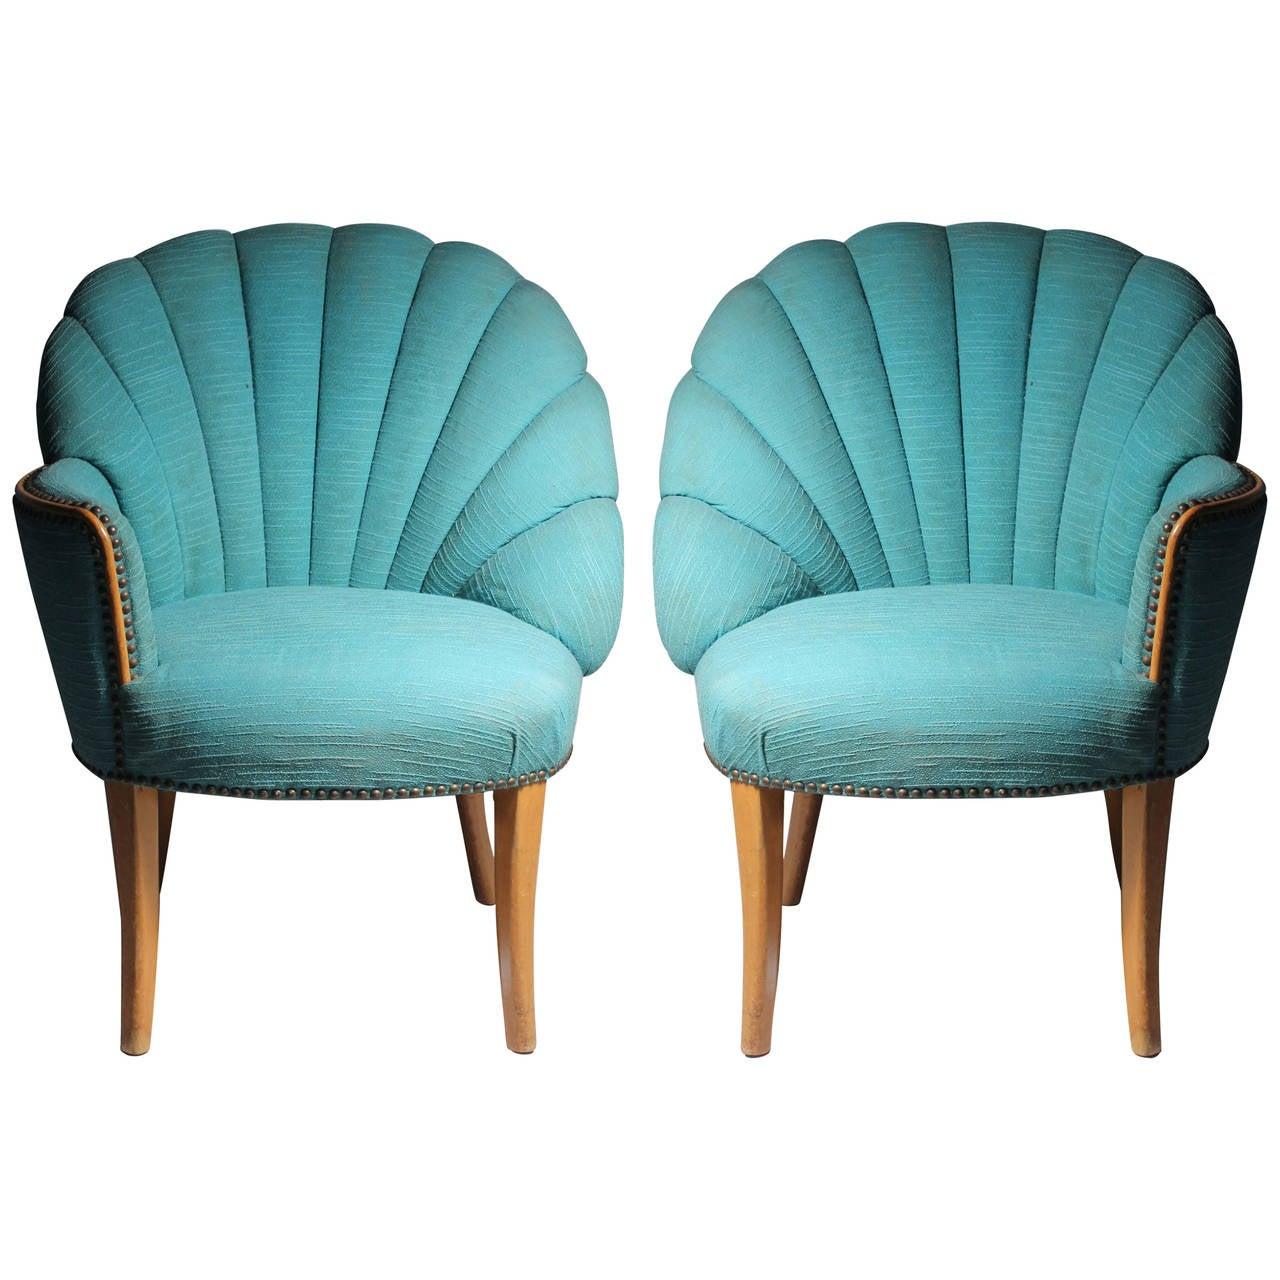 Vintage Asymmetrical Hollywood Regency Fan Back Chairs   Grosfeld House For  Sale